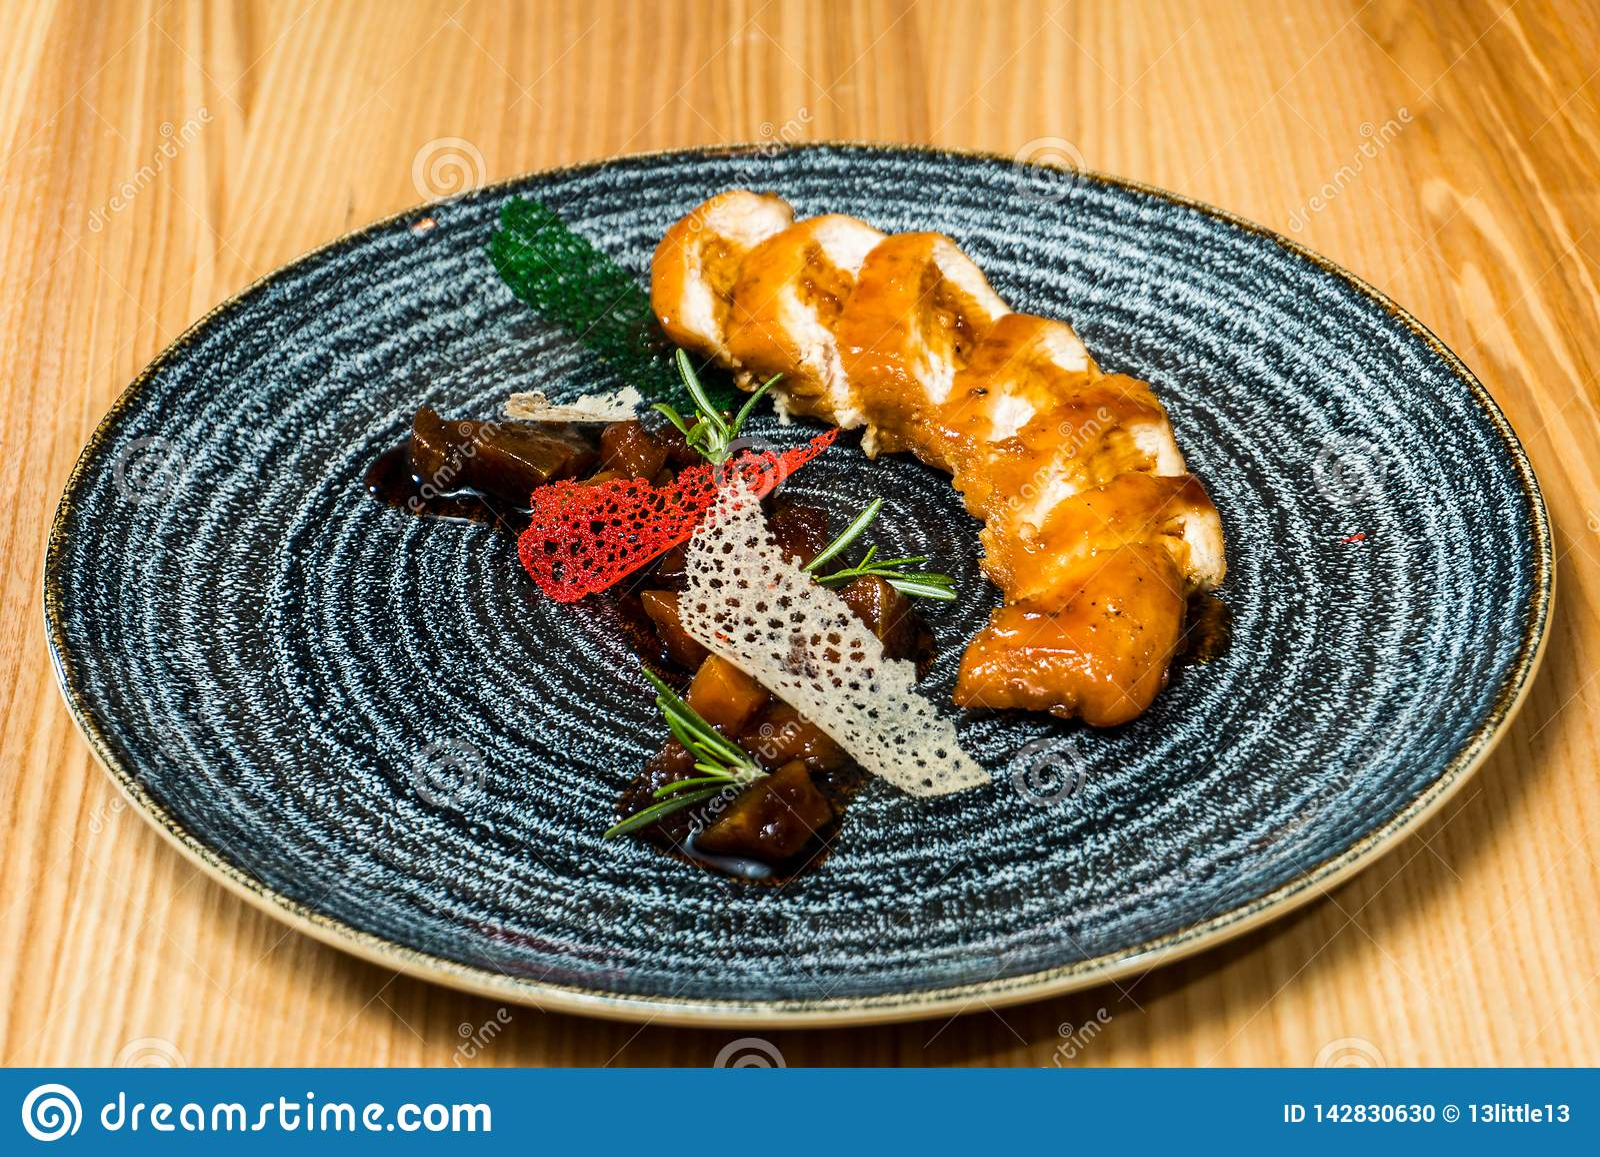 Chicken roll in a black plate